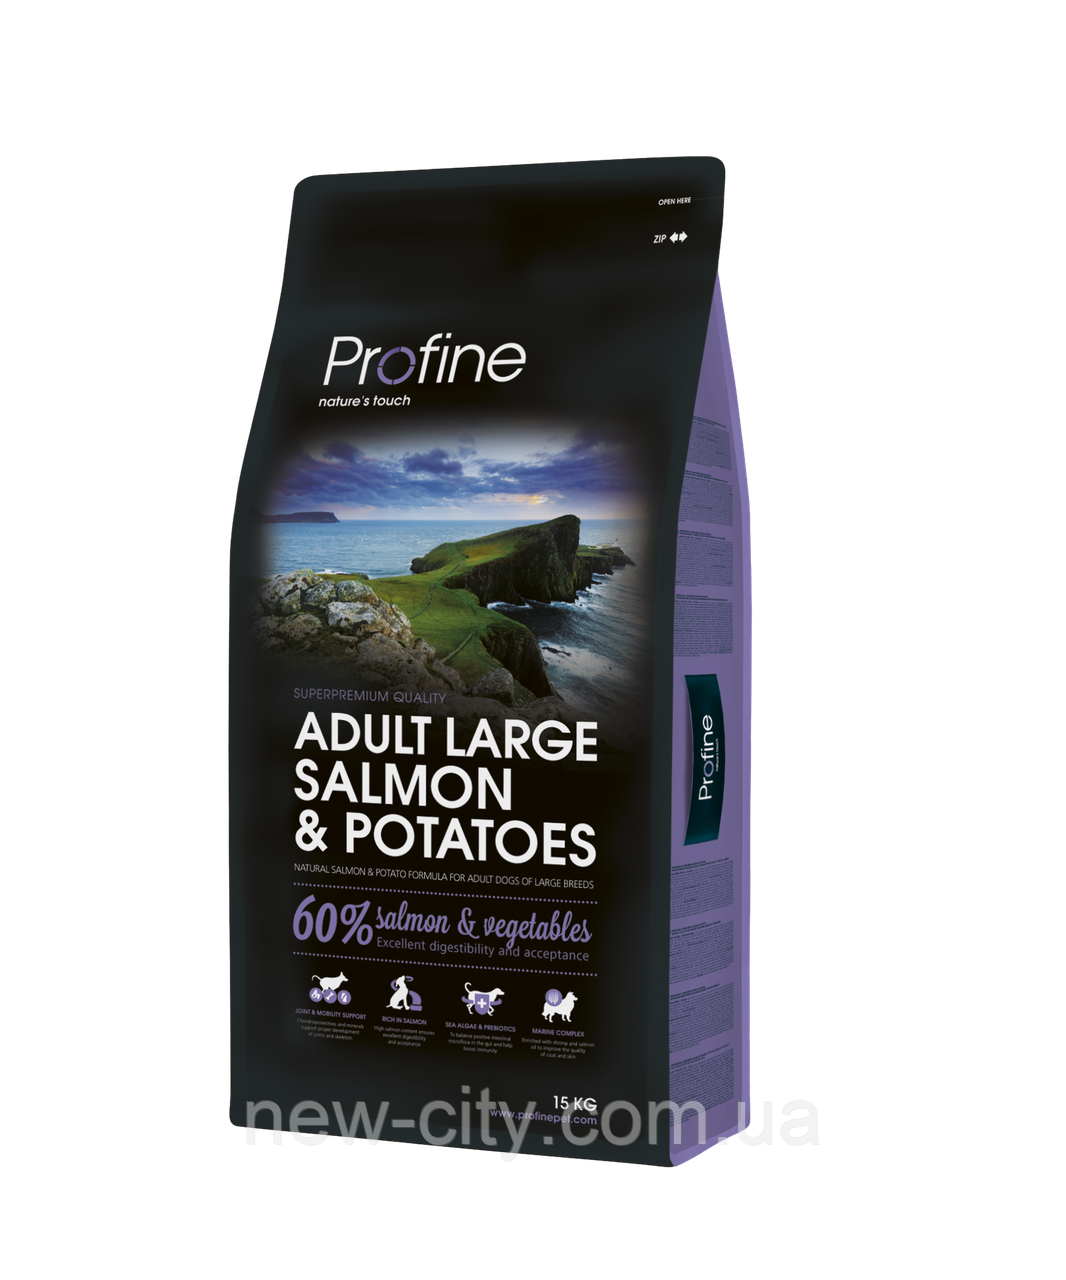 Profine Adult Large Breed Salmon 15kg корм для взрослых собак пород крупных лосось